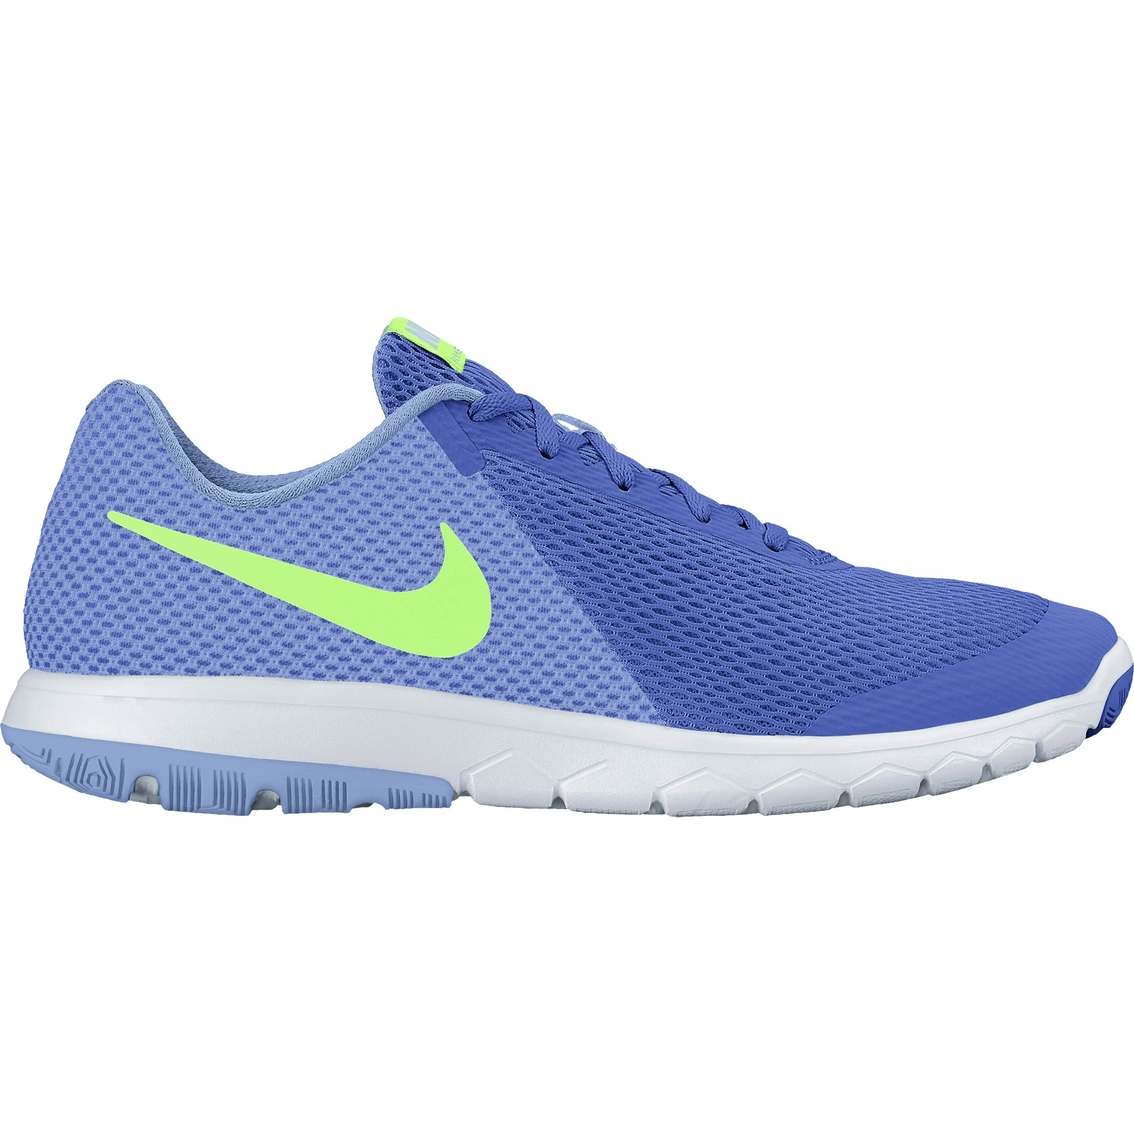 6b7dea75ccf29 Nike Women s Flex Experience Rn 6 Running Shoes